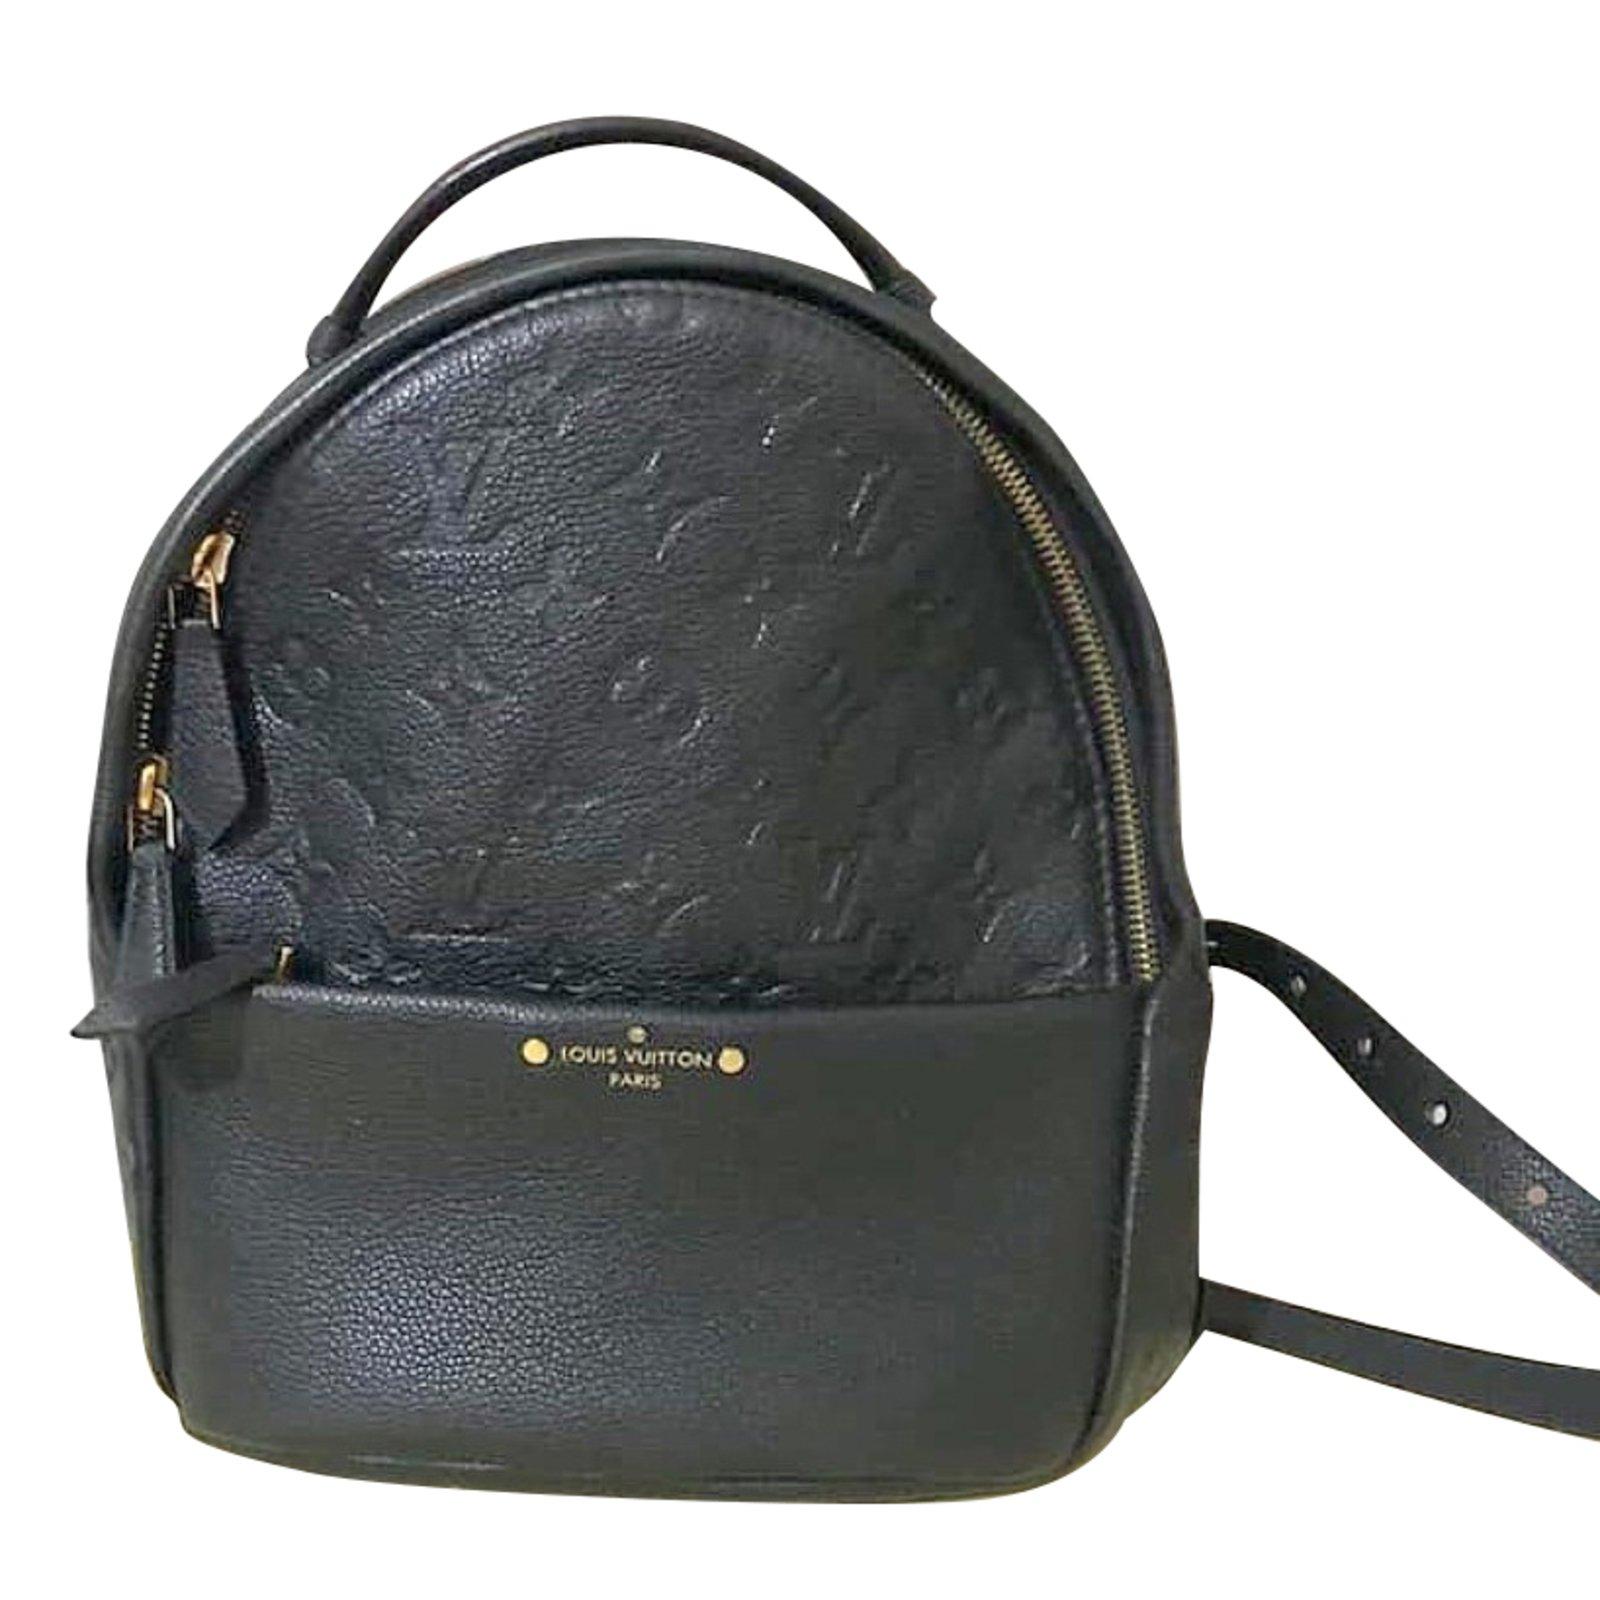 aebea09af9 Louis Vuitton Sorbonne Backpacks Leather Black ref.81613 - Joli Closet